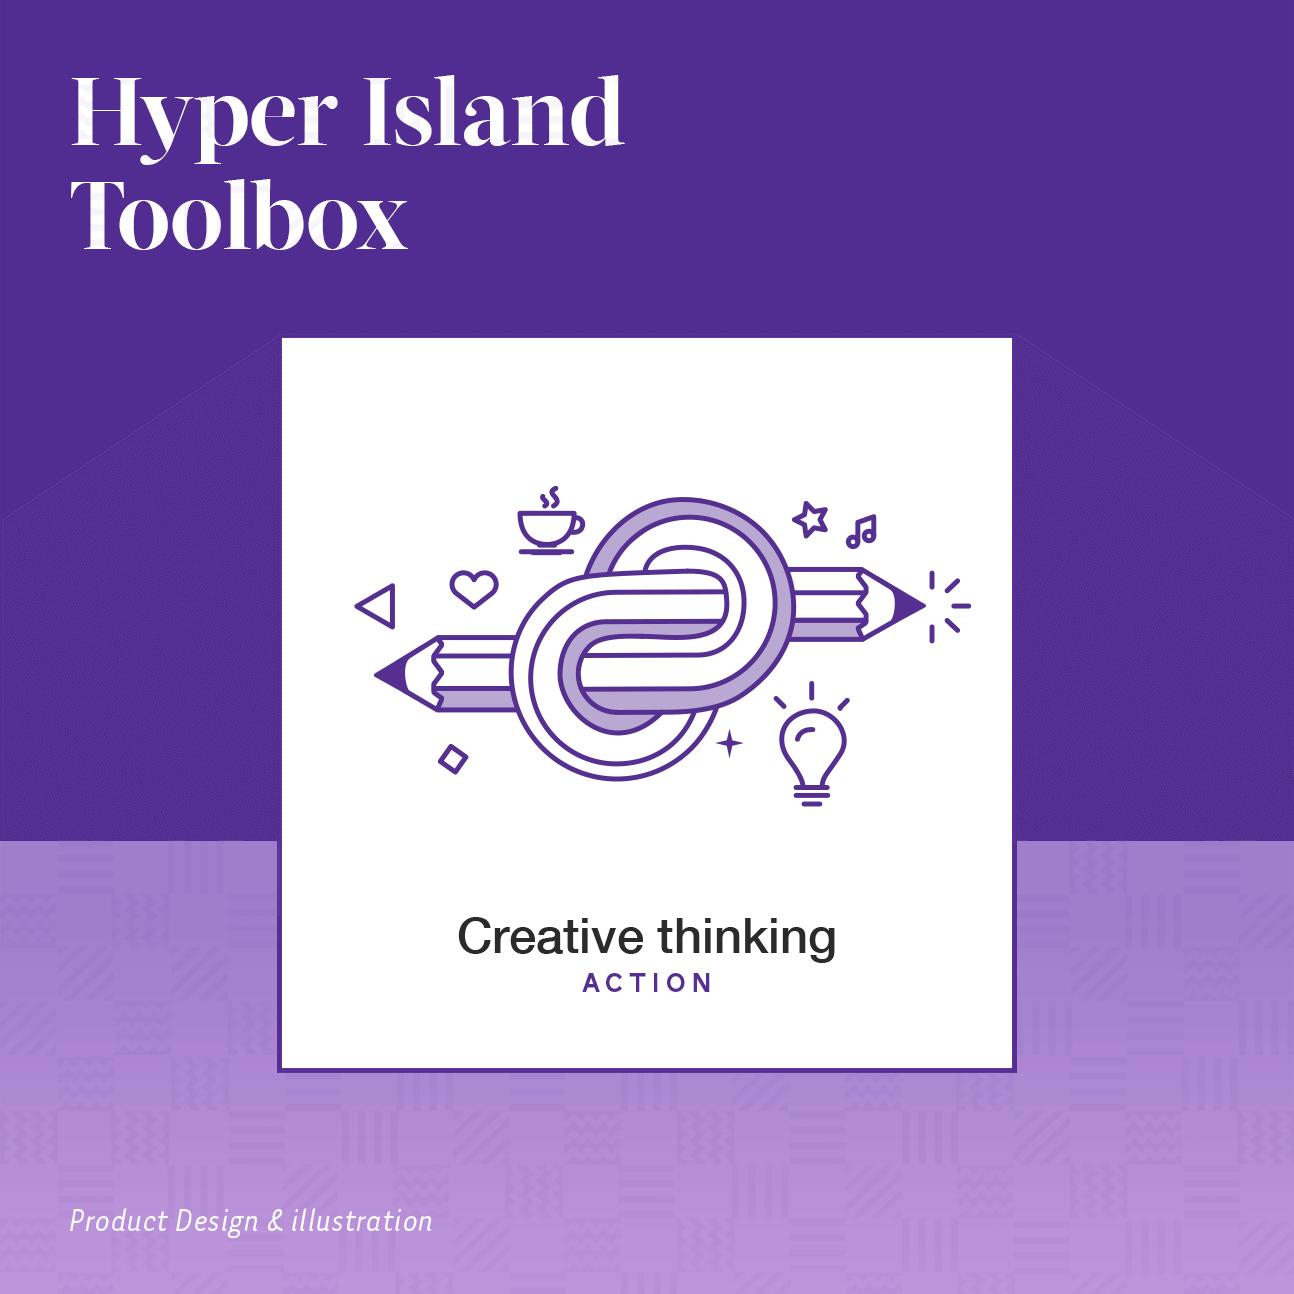 Hyper Island Toolbox